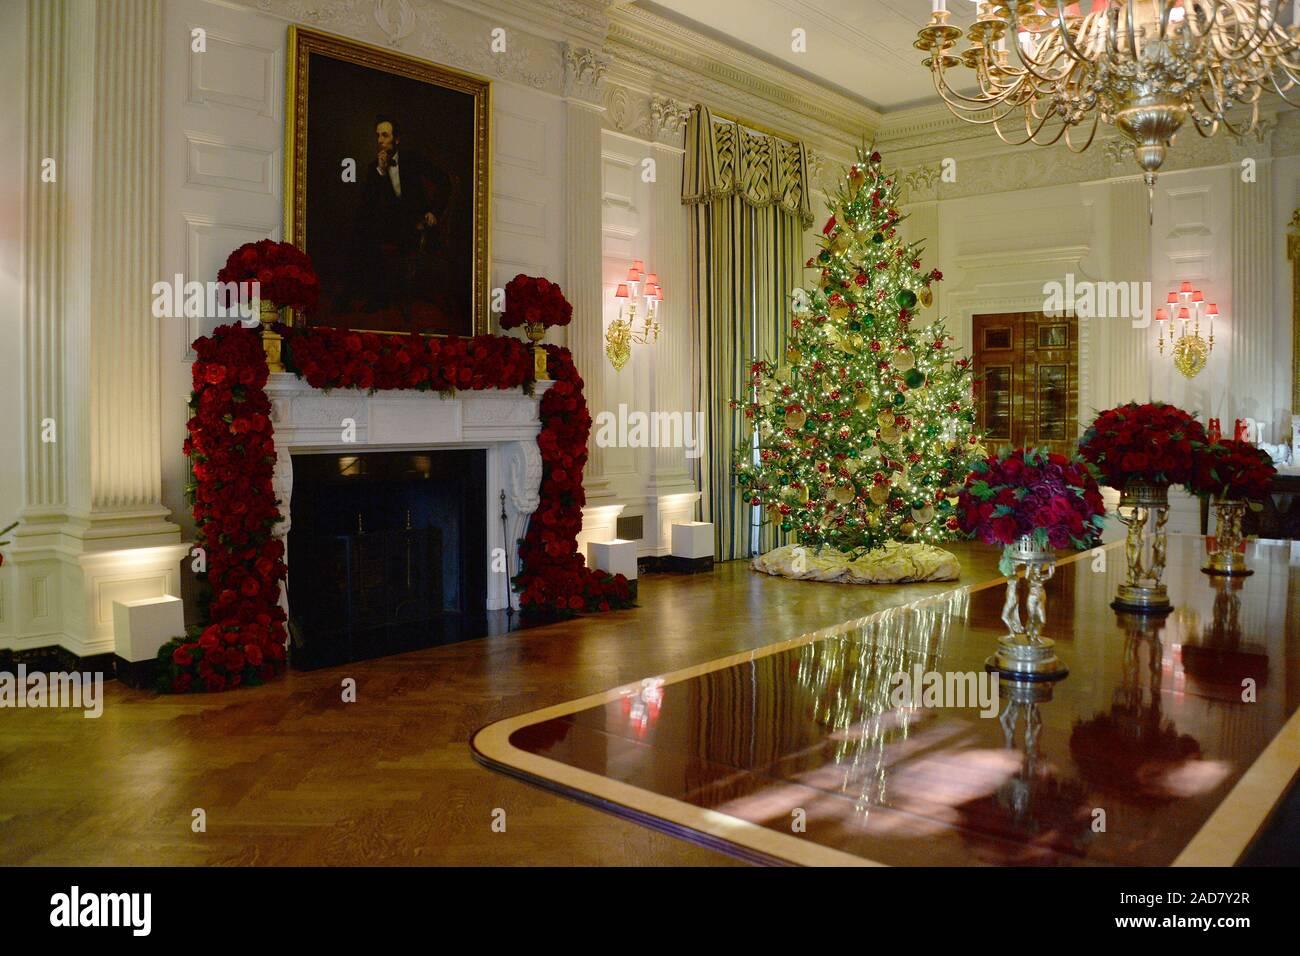 Washington Dc Usa 3rd Dec 2019 12 3 19 The White House